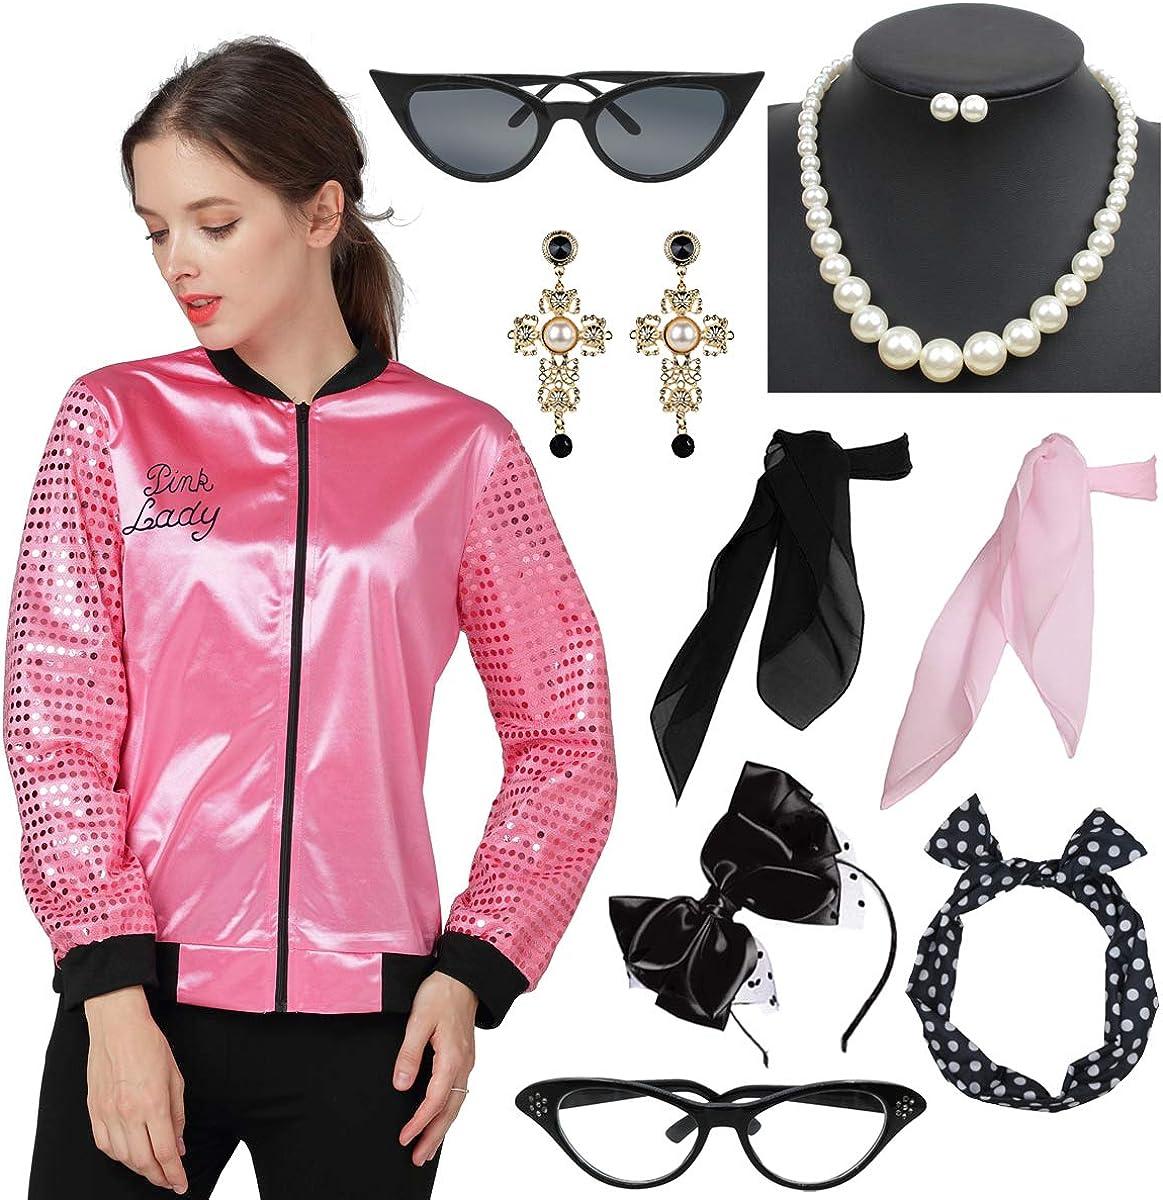 Women's 50s Retro Ranking Low price TOP14 Sequin Sleeve Pink Jacket Neck Costume Sc with